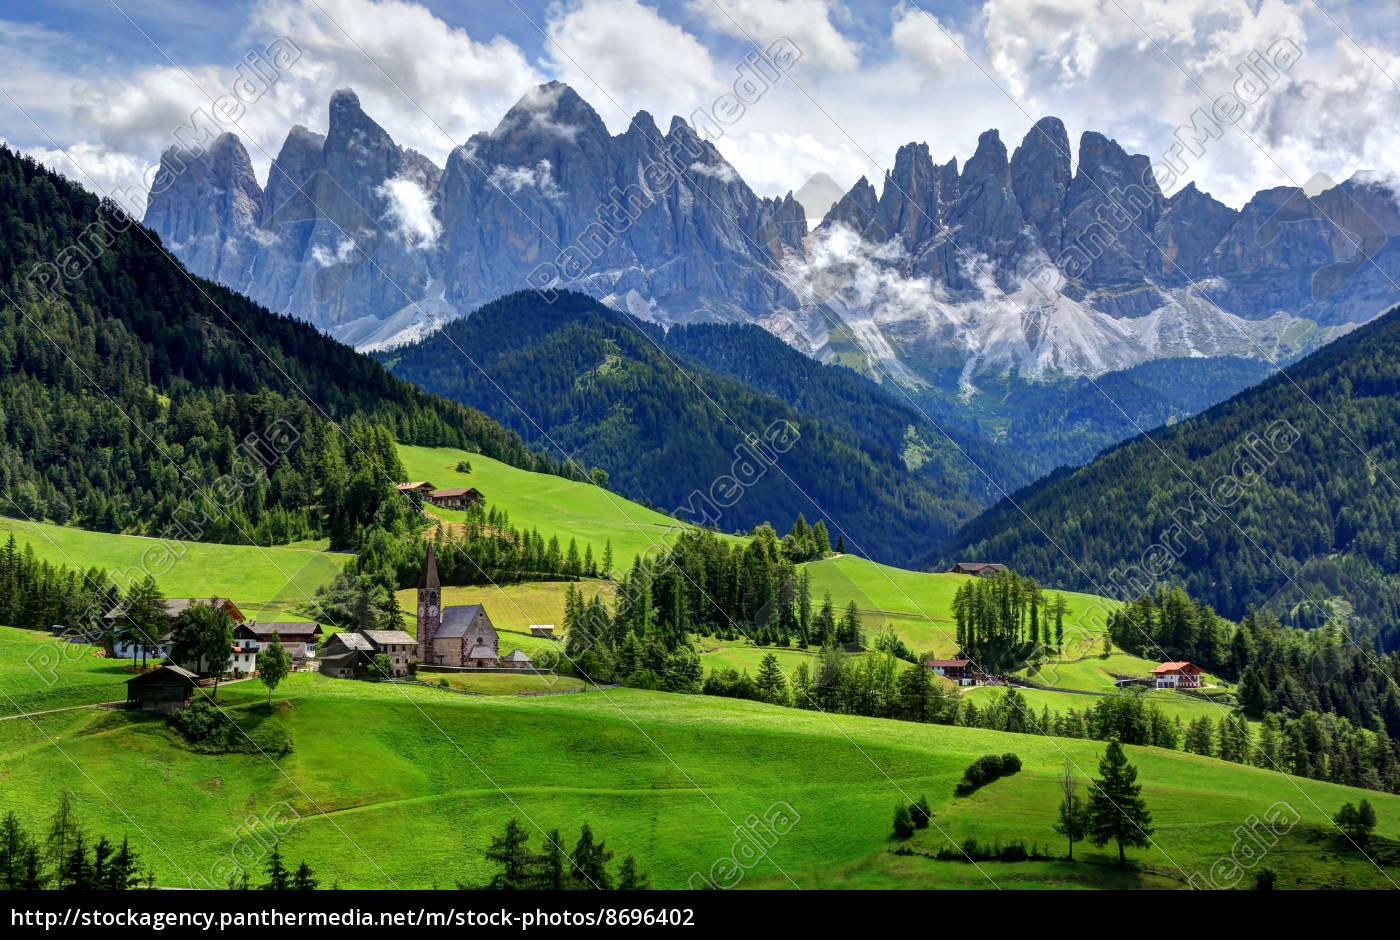 mountains, dolomites, alps, south tyrol, high mountains, alpine scenery - 8696402